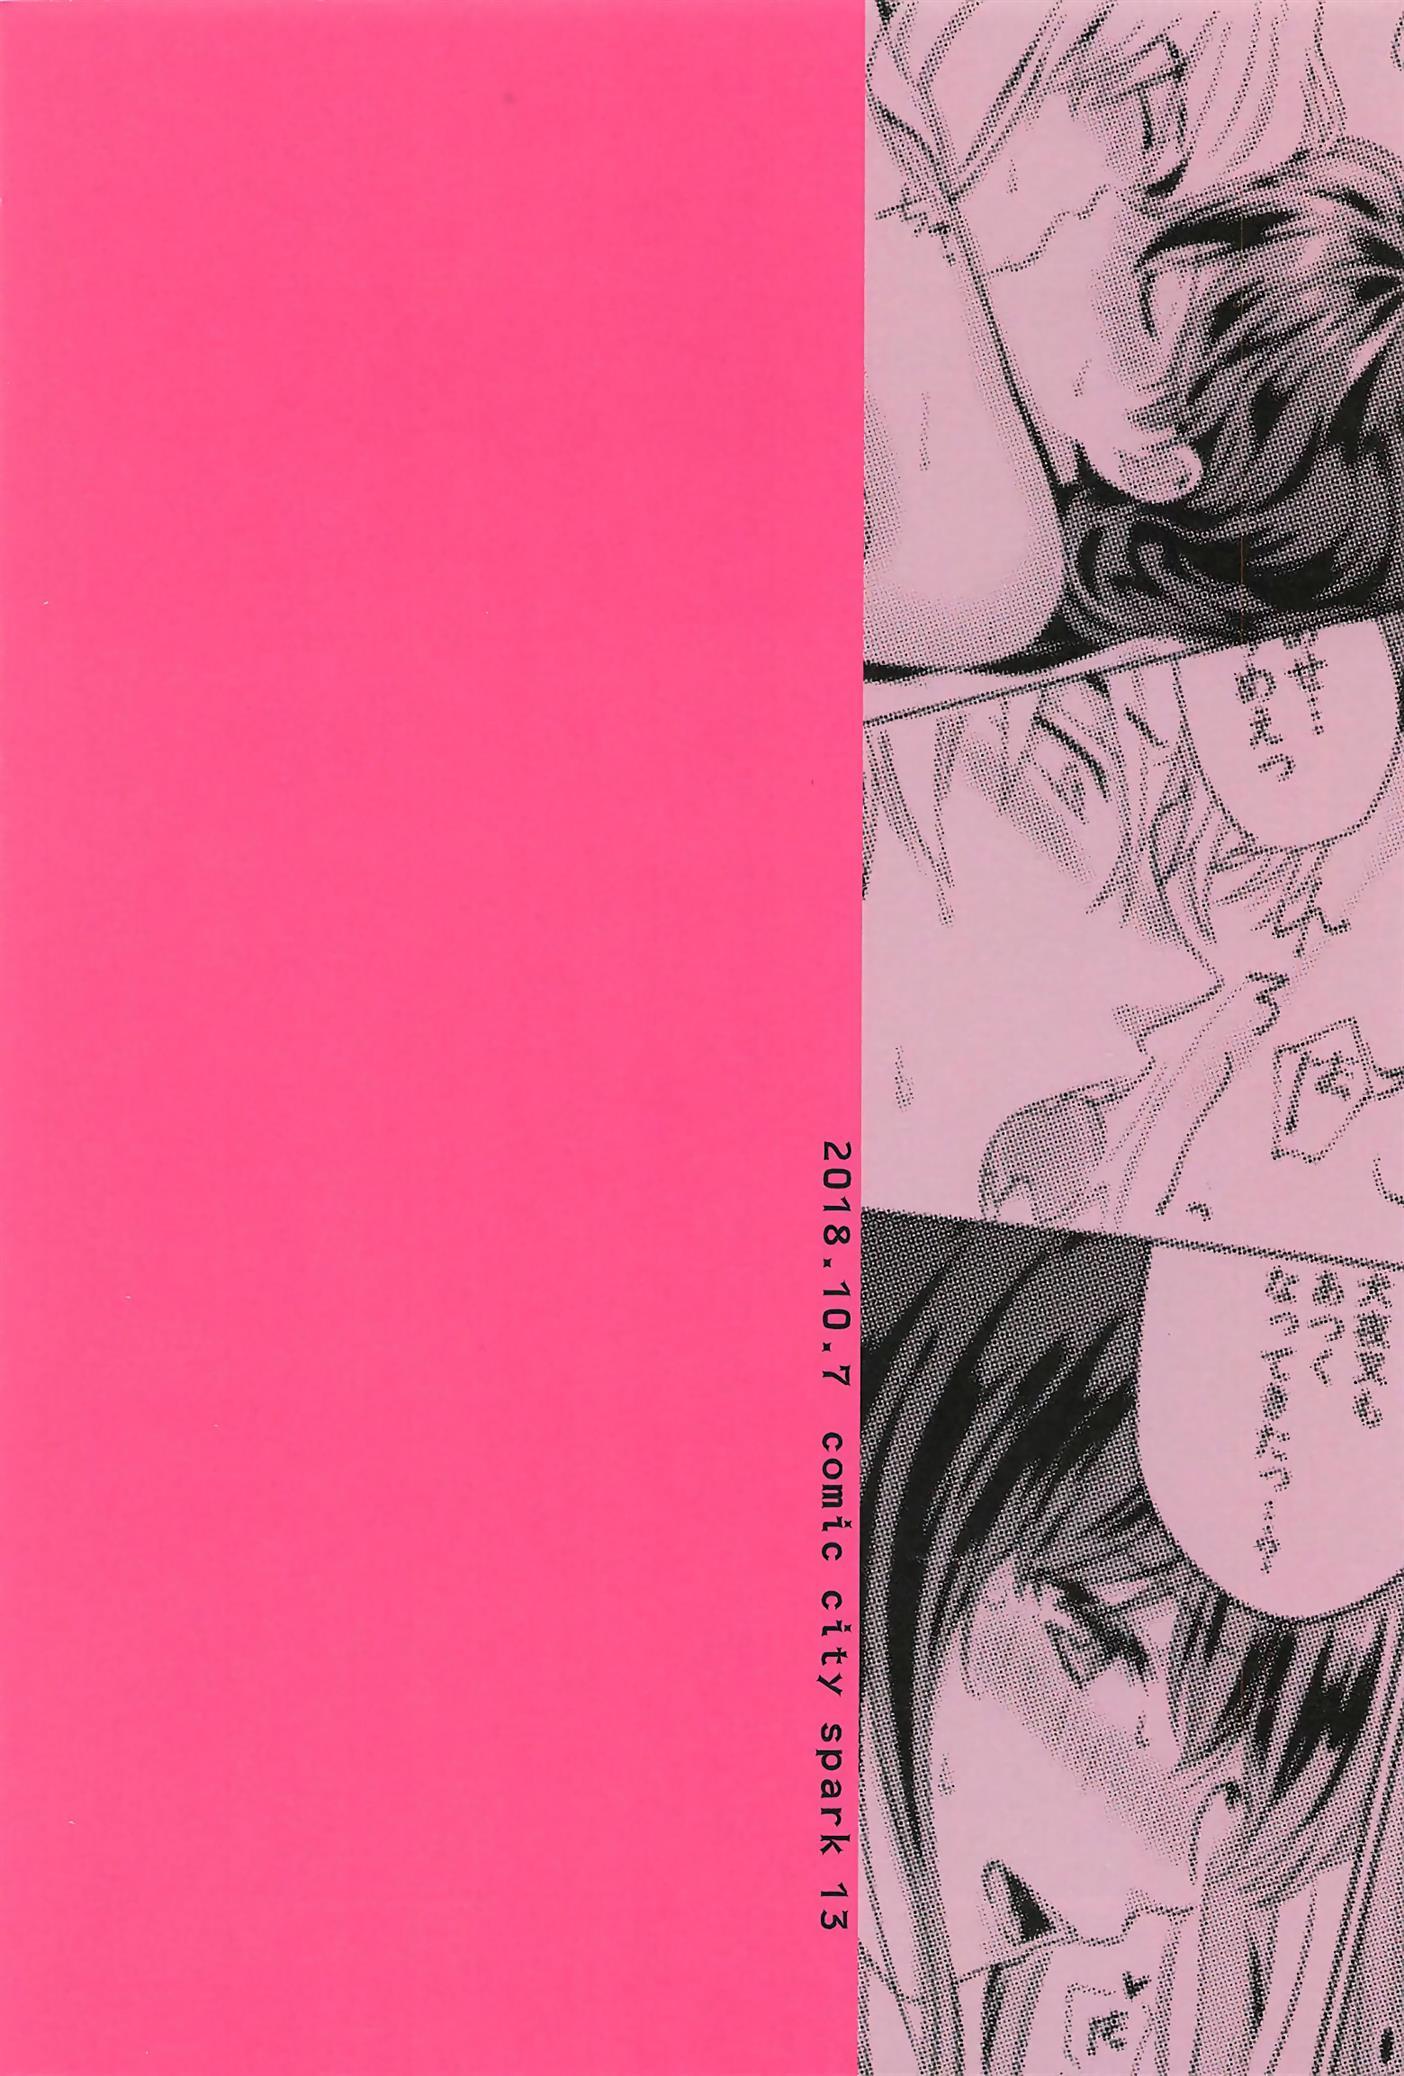 Inuyasha Hentai Sexo Quente - Foto 26